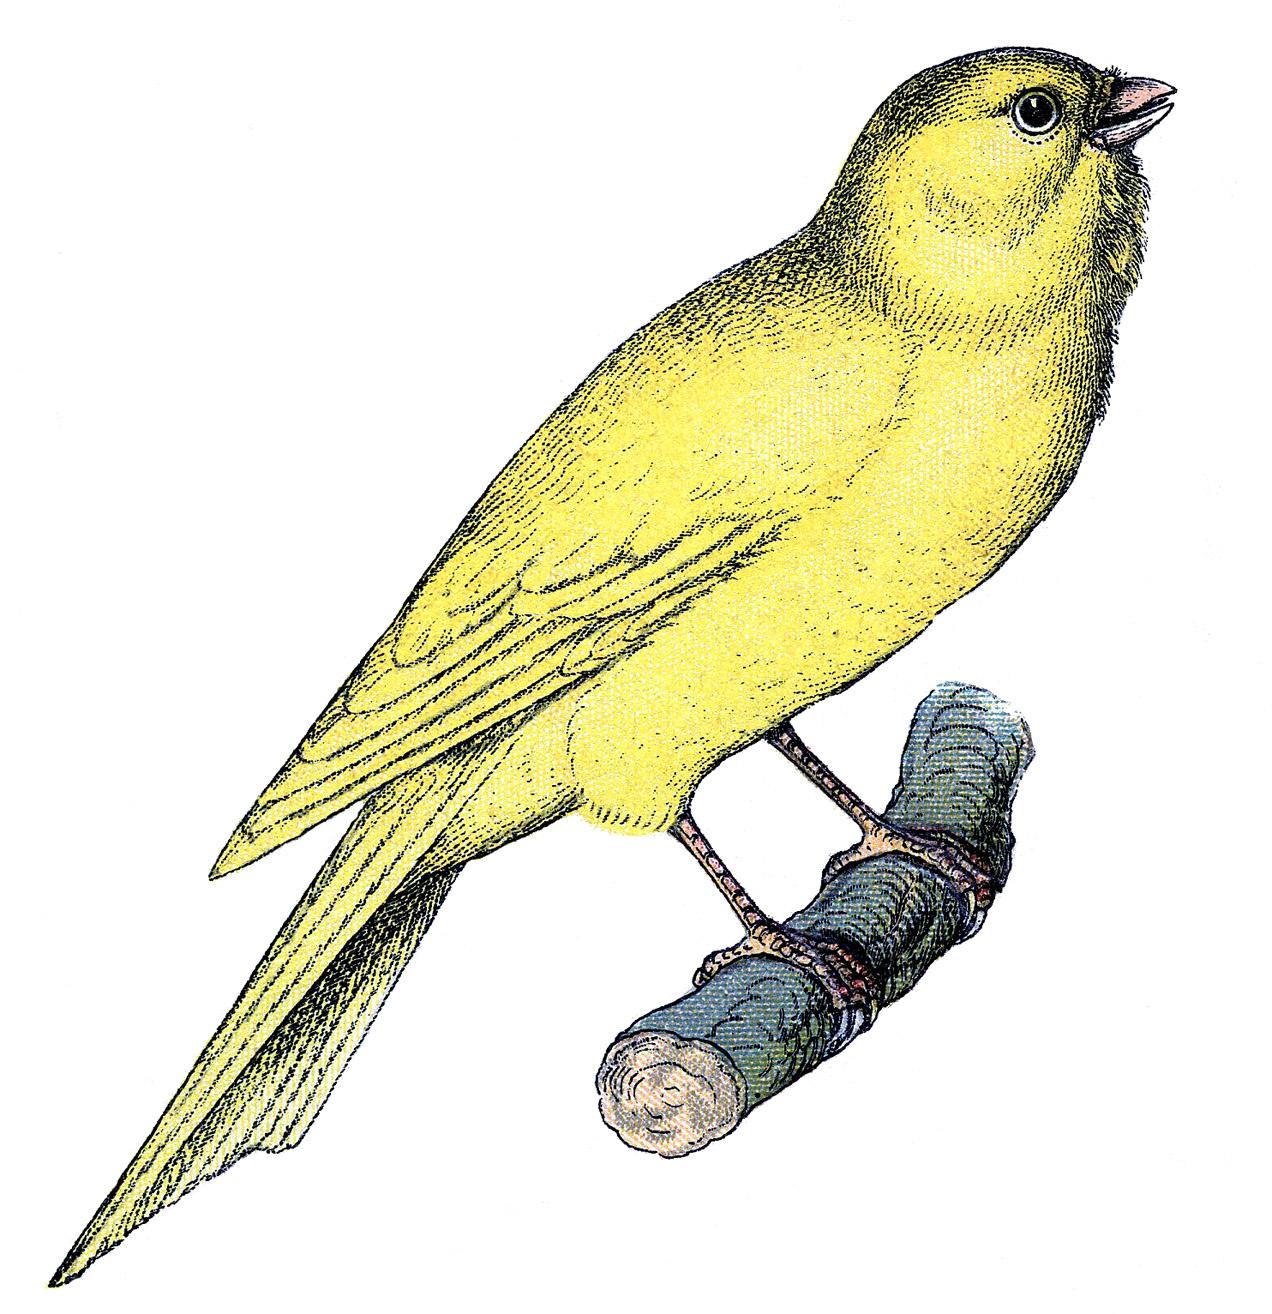 What's this about a Canary?! Lol. – El Puerto de Santa Maria, Cadiz, Spain, 1975